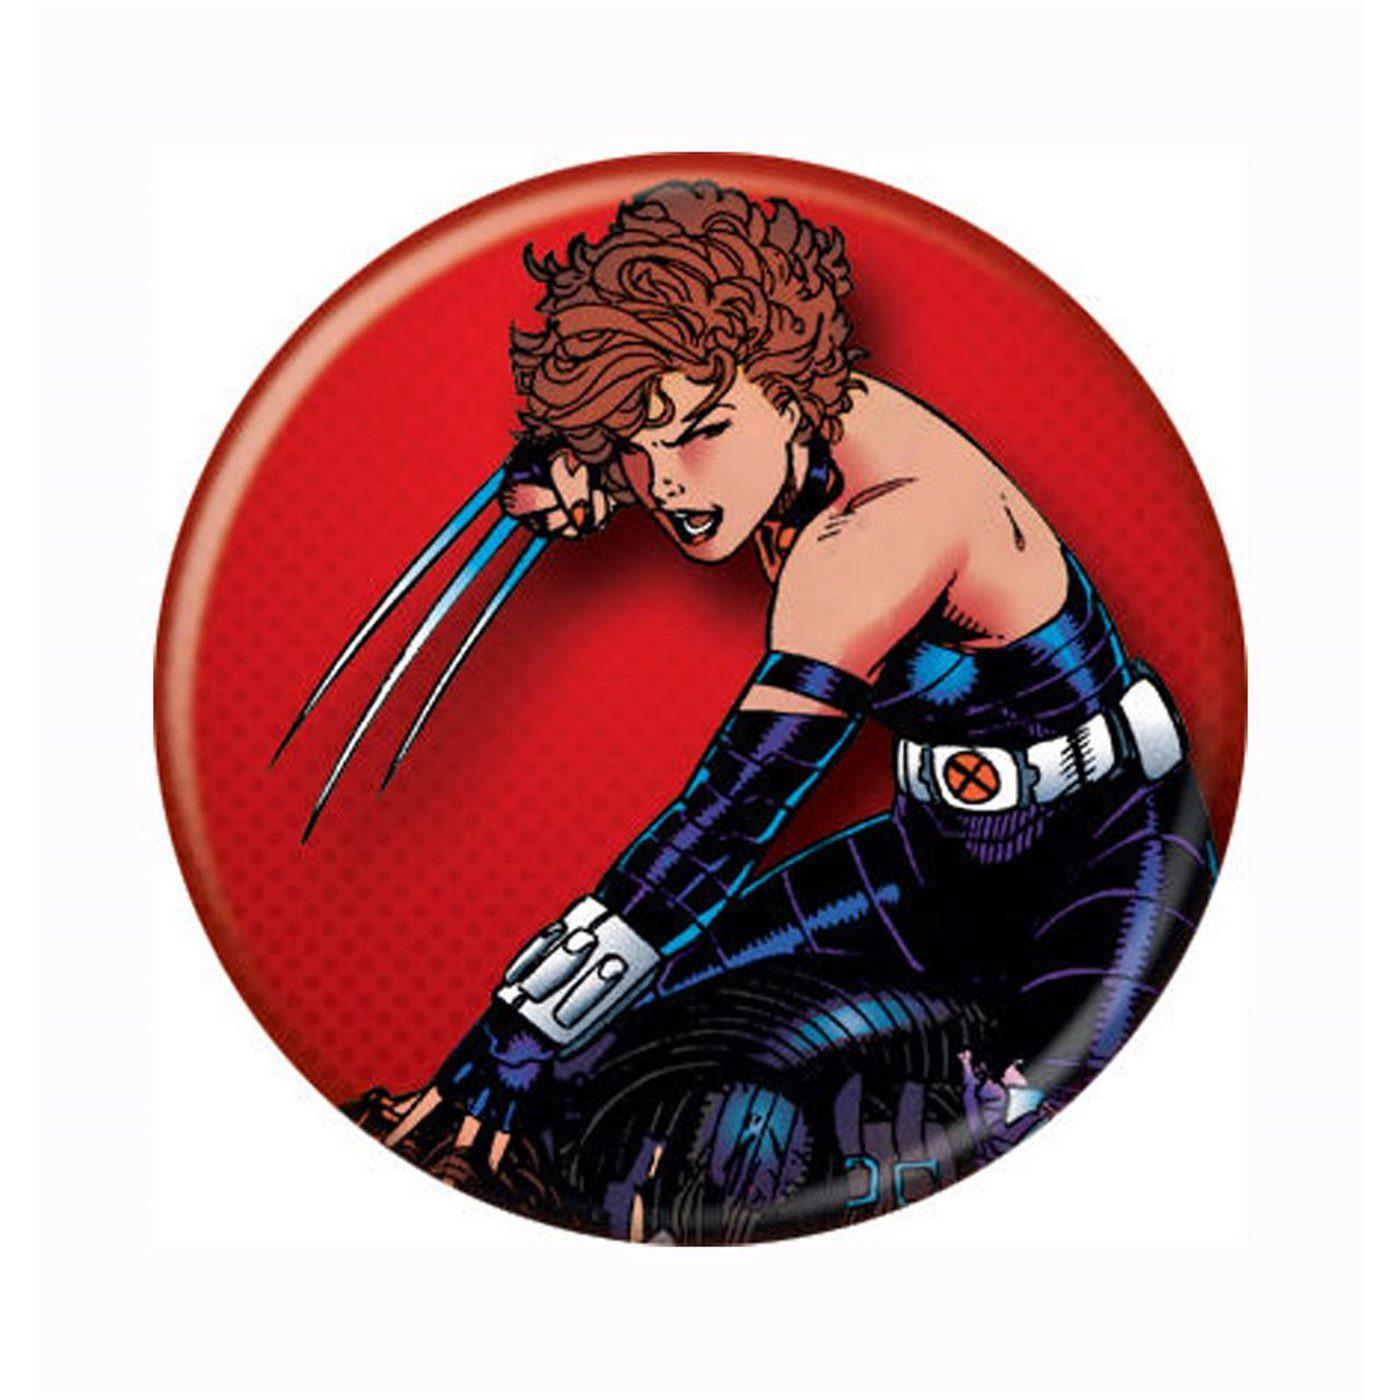 X-Men Kitty Pryde Shadowcat Claws Button